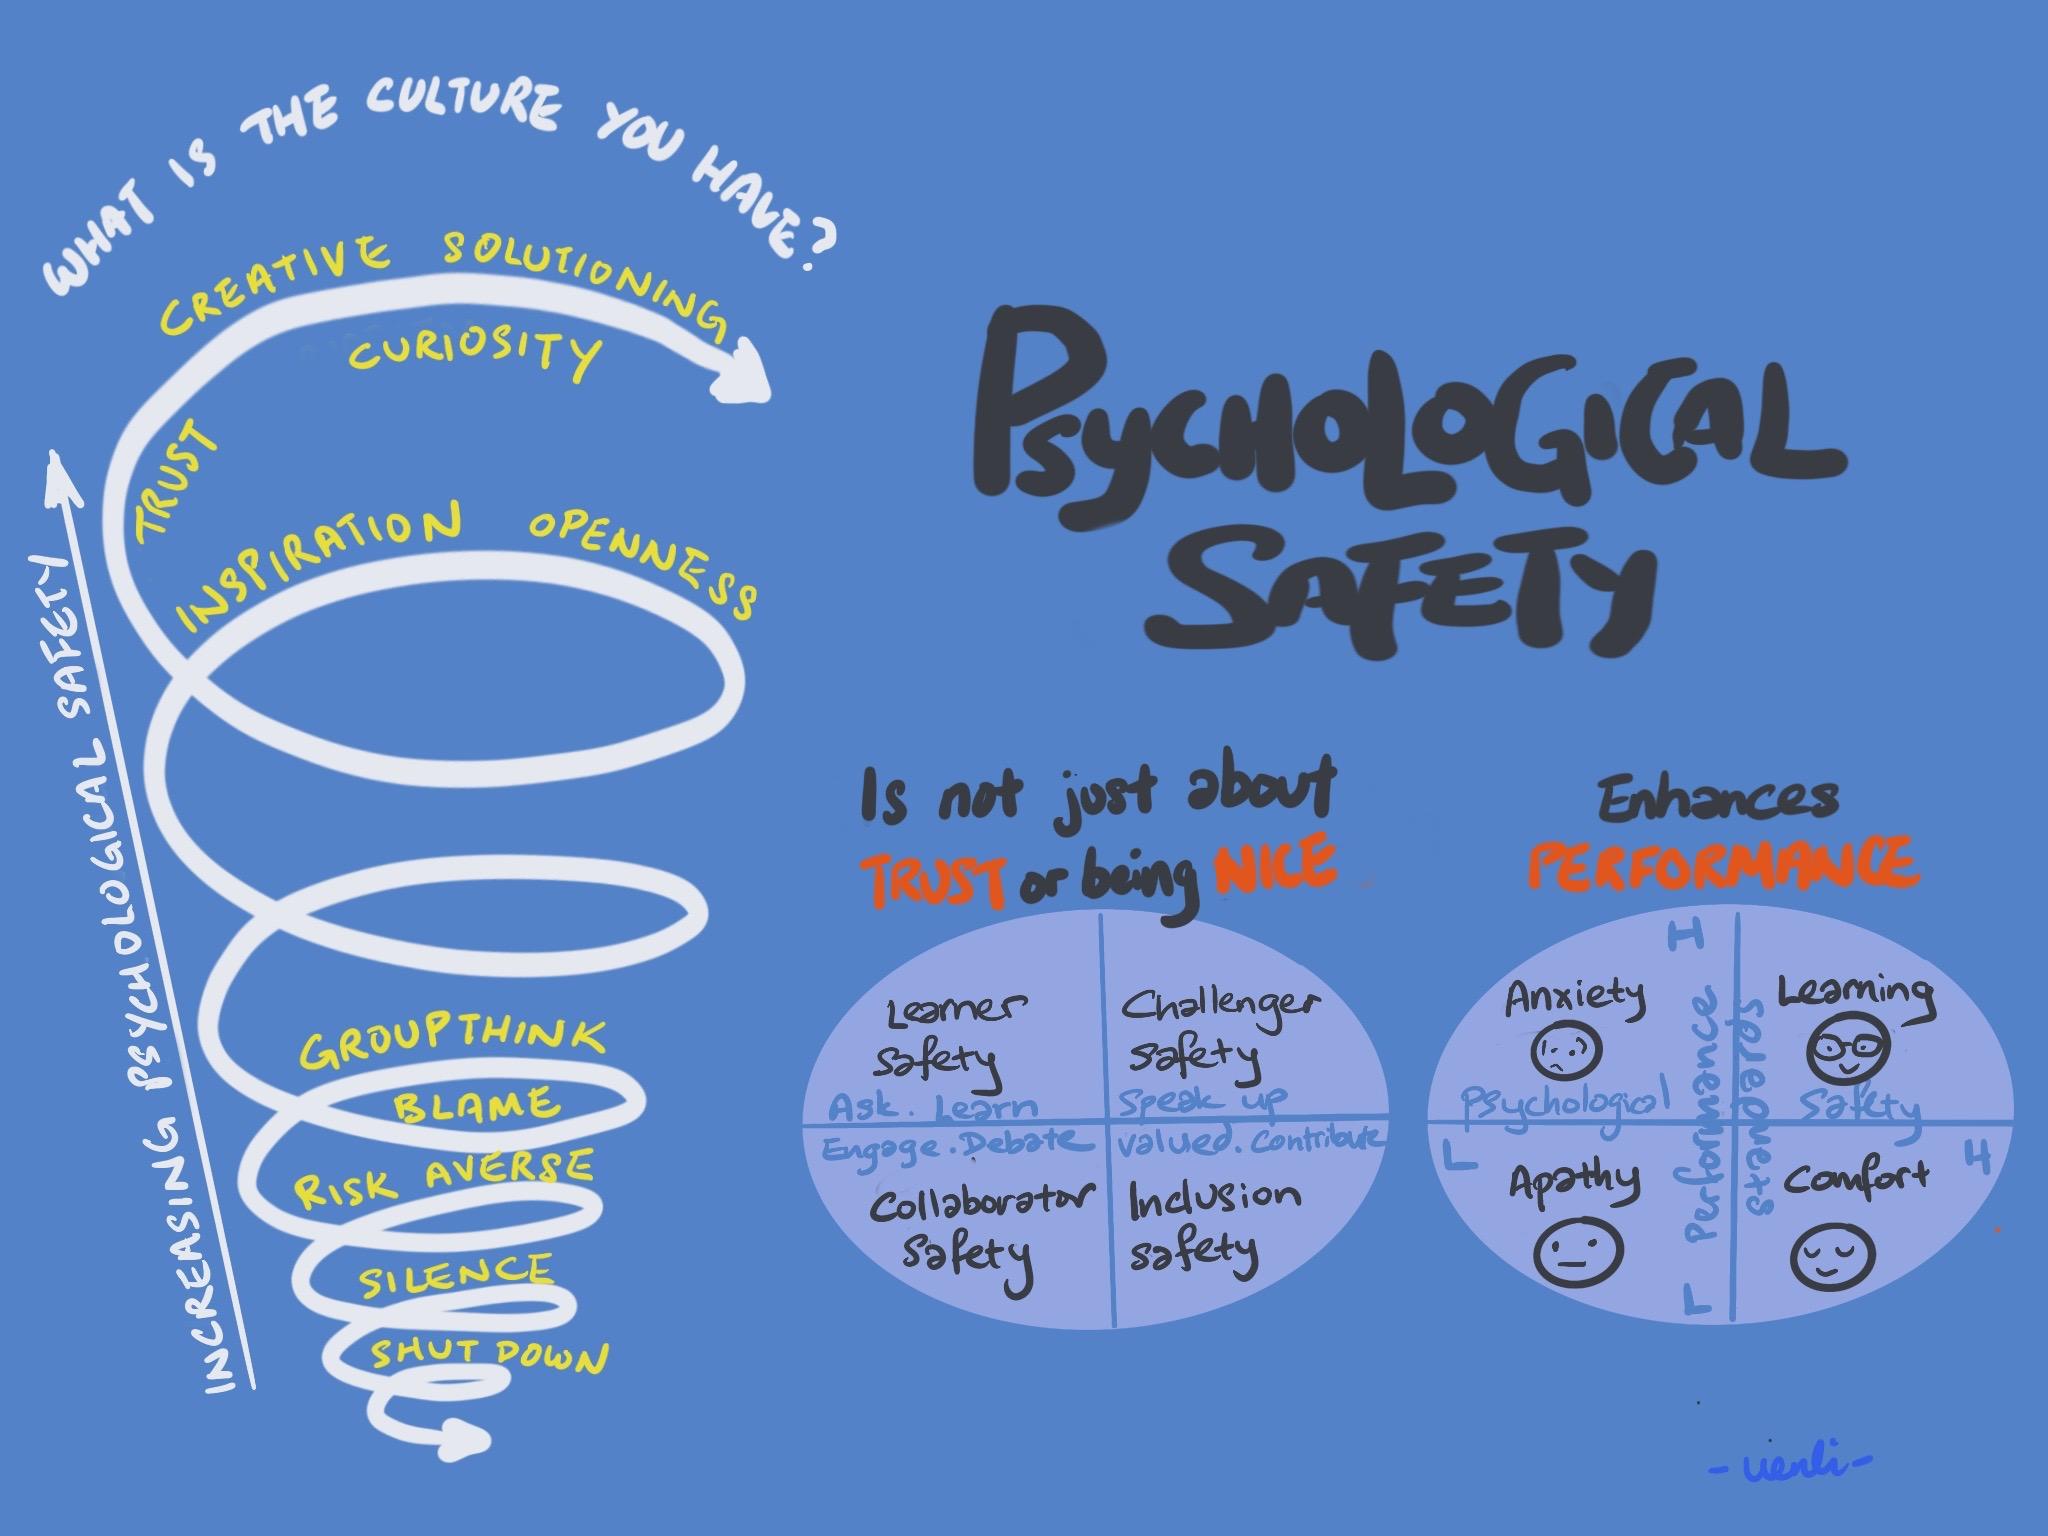 Psychological Safety Image